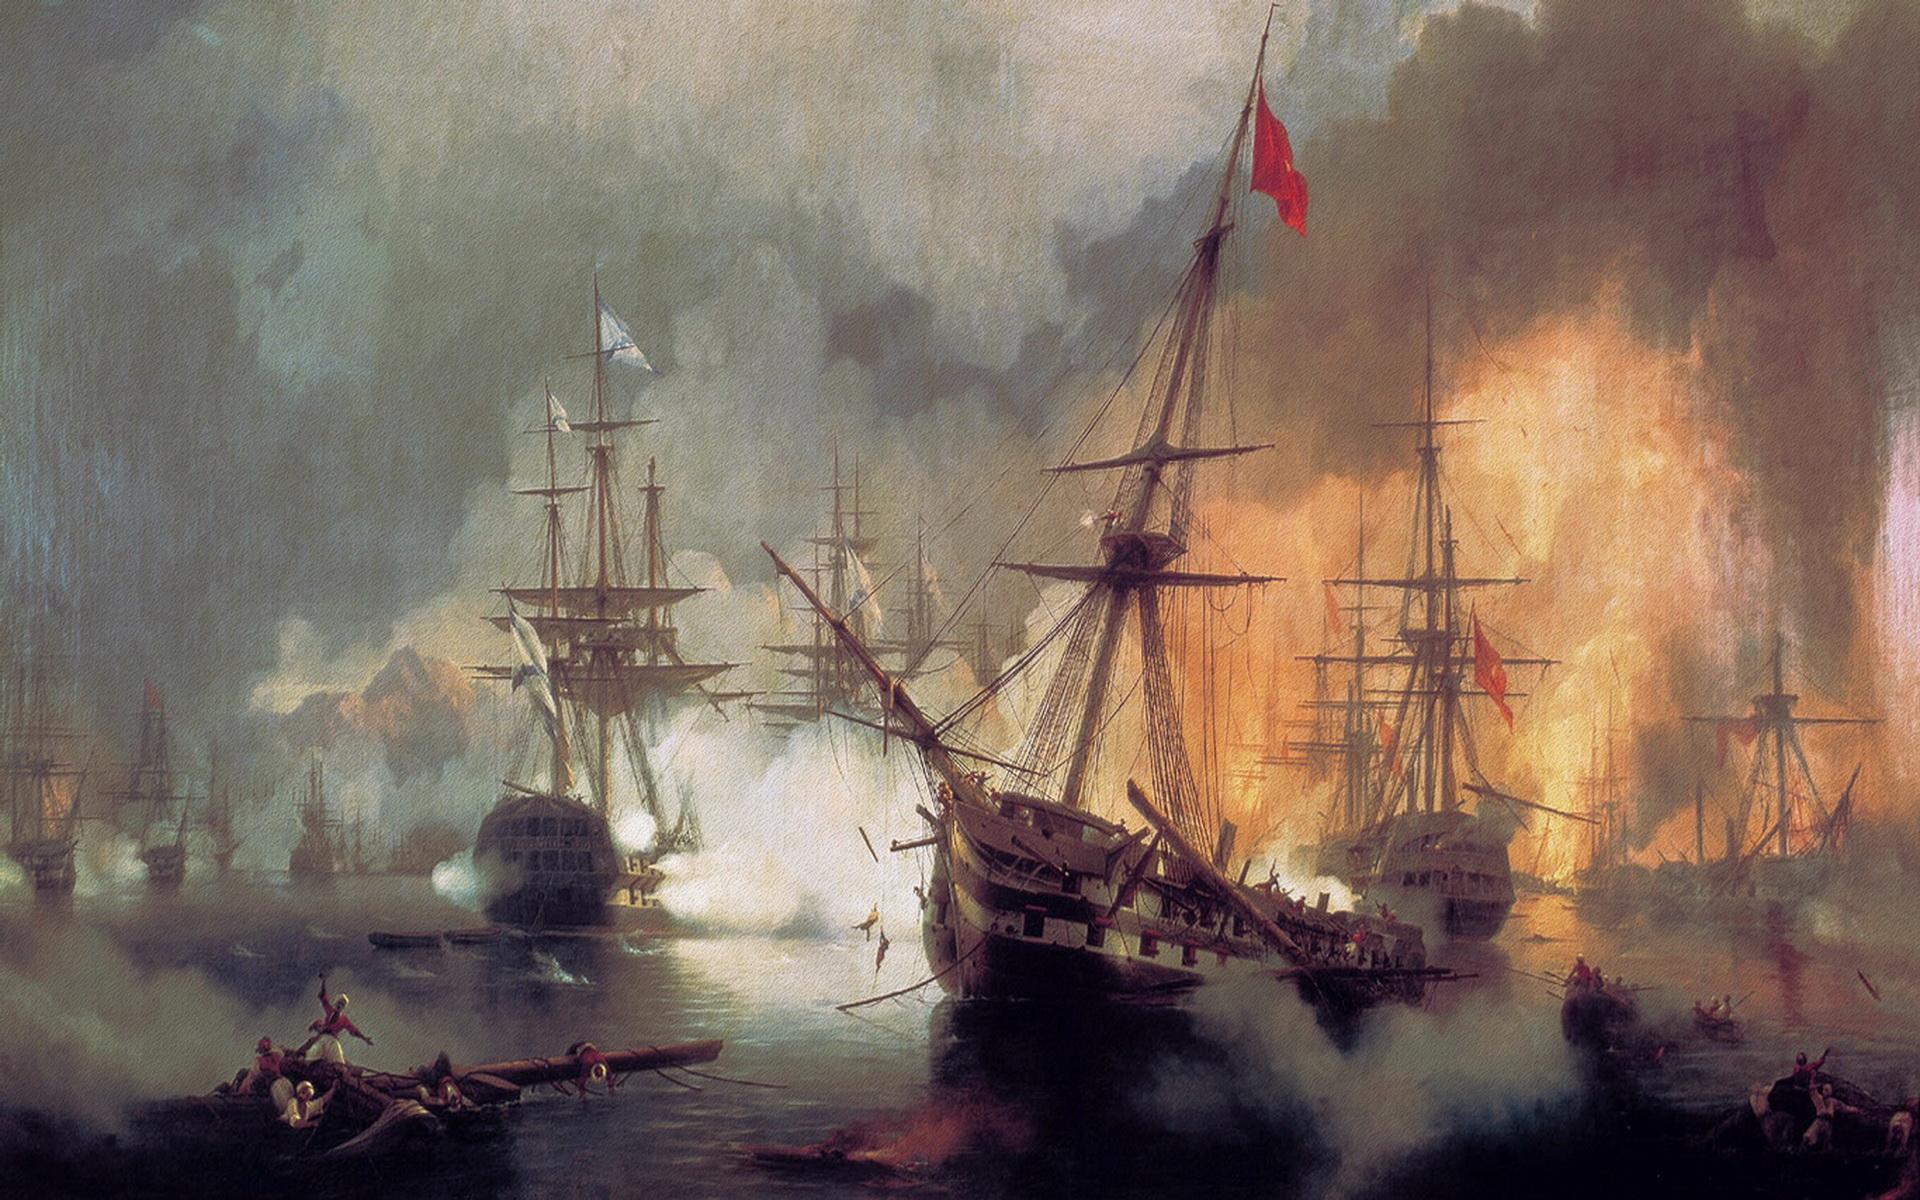 oil painting wallpaper hd,sailing ship,vehicle,flagship,east indiaman,ship